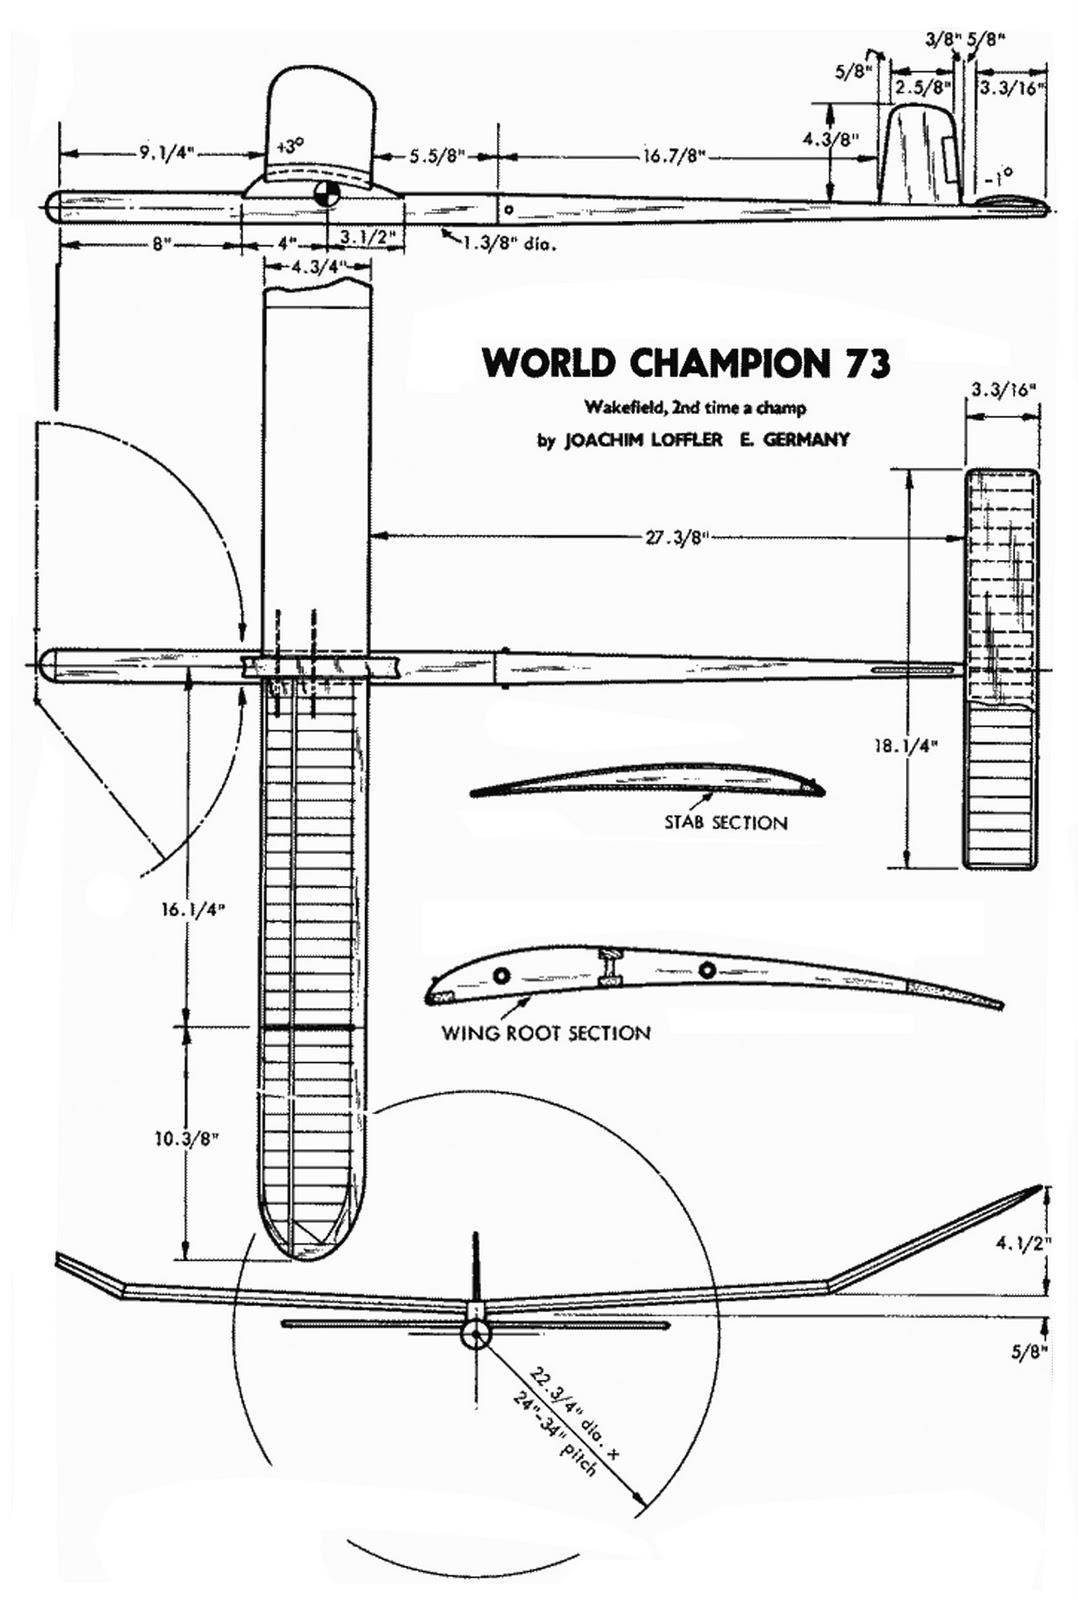 http://lh5.ggpht.com/-dK1vogfdT8Y/TvkIiicVzSI/AAAAAAAABtE/I4rqcmV91t0/s1600/Loffler-Wakefield-Champion-.jpg